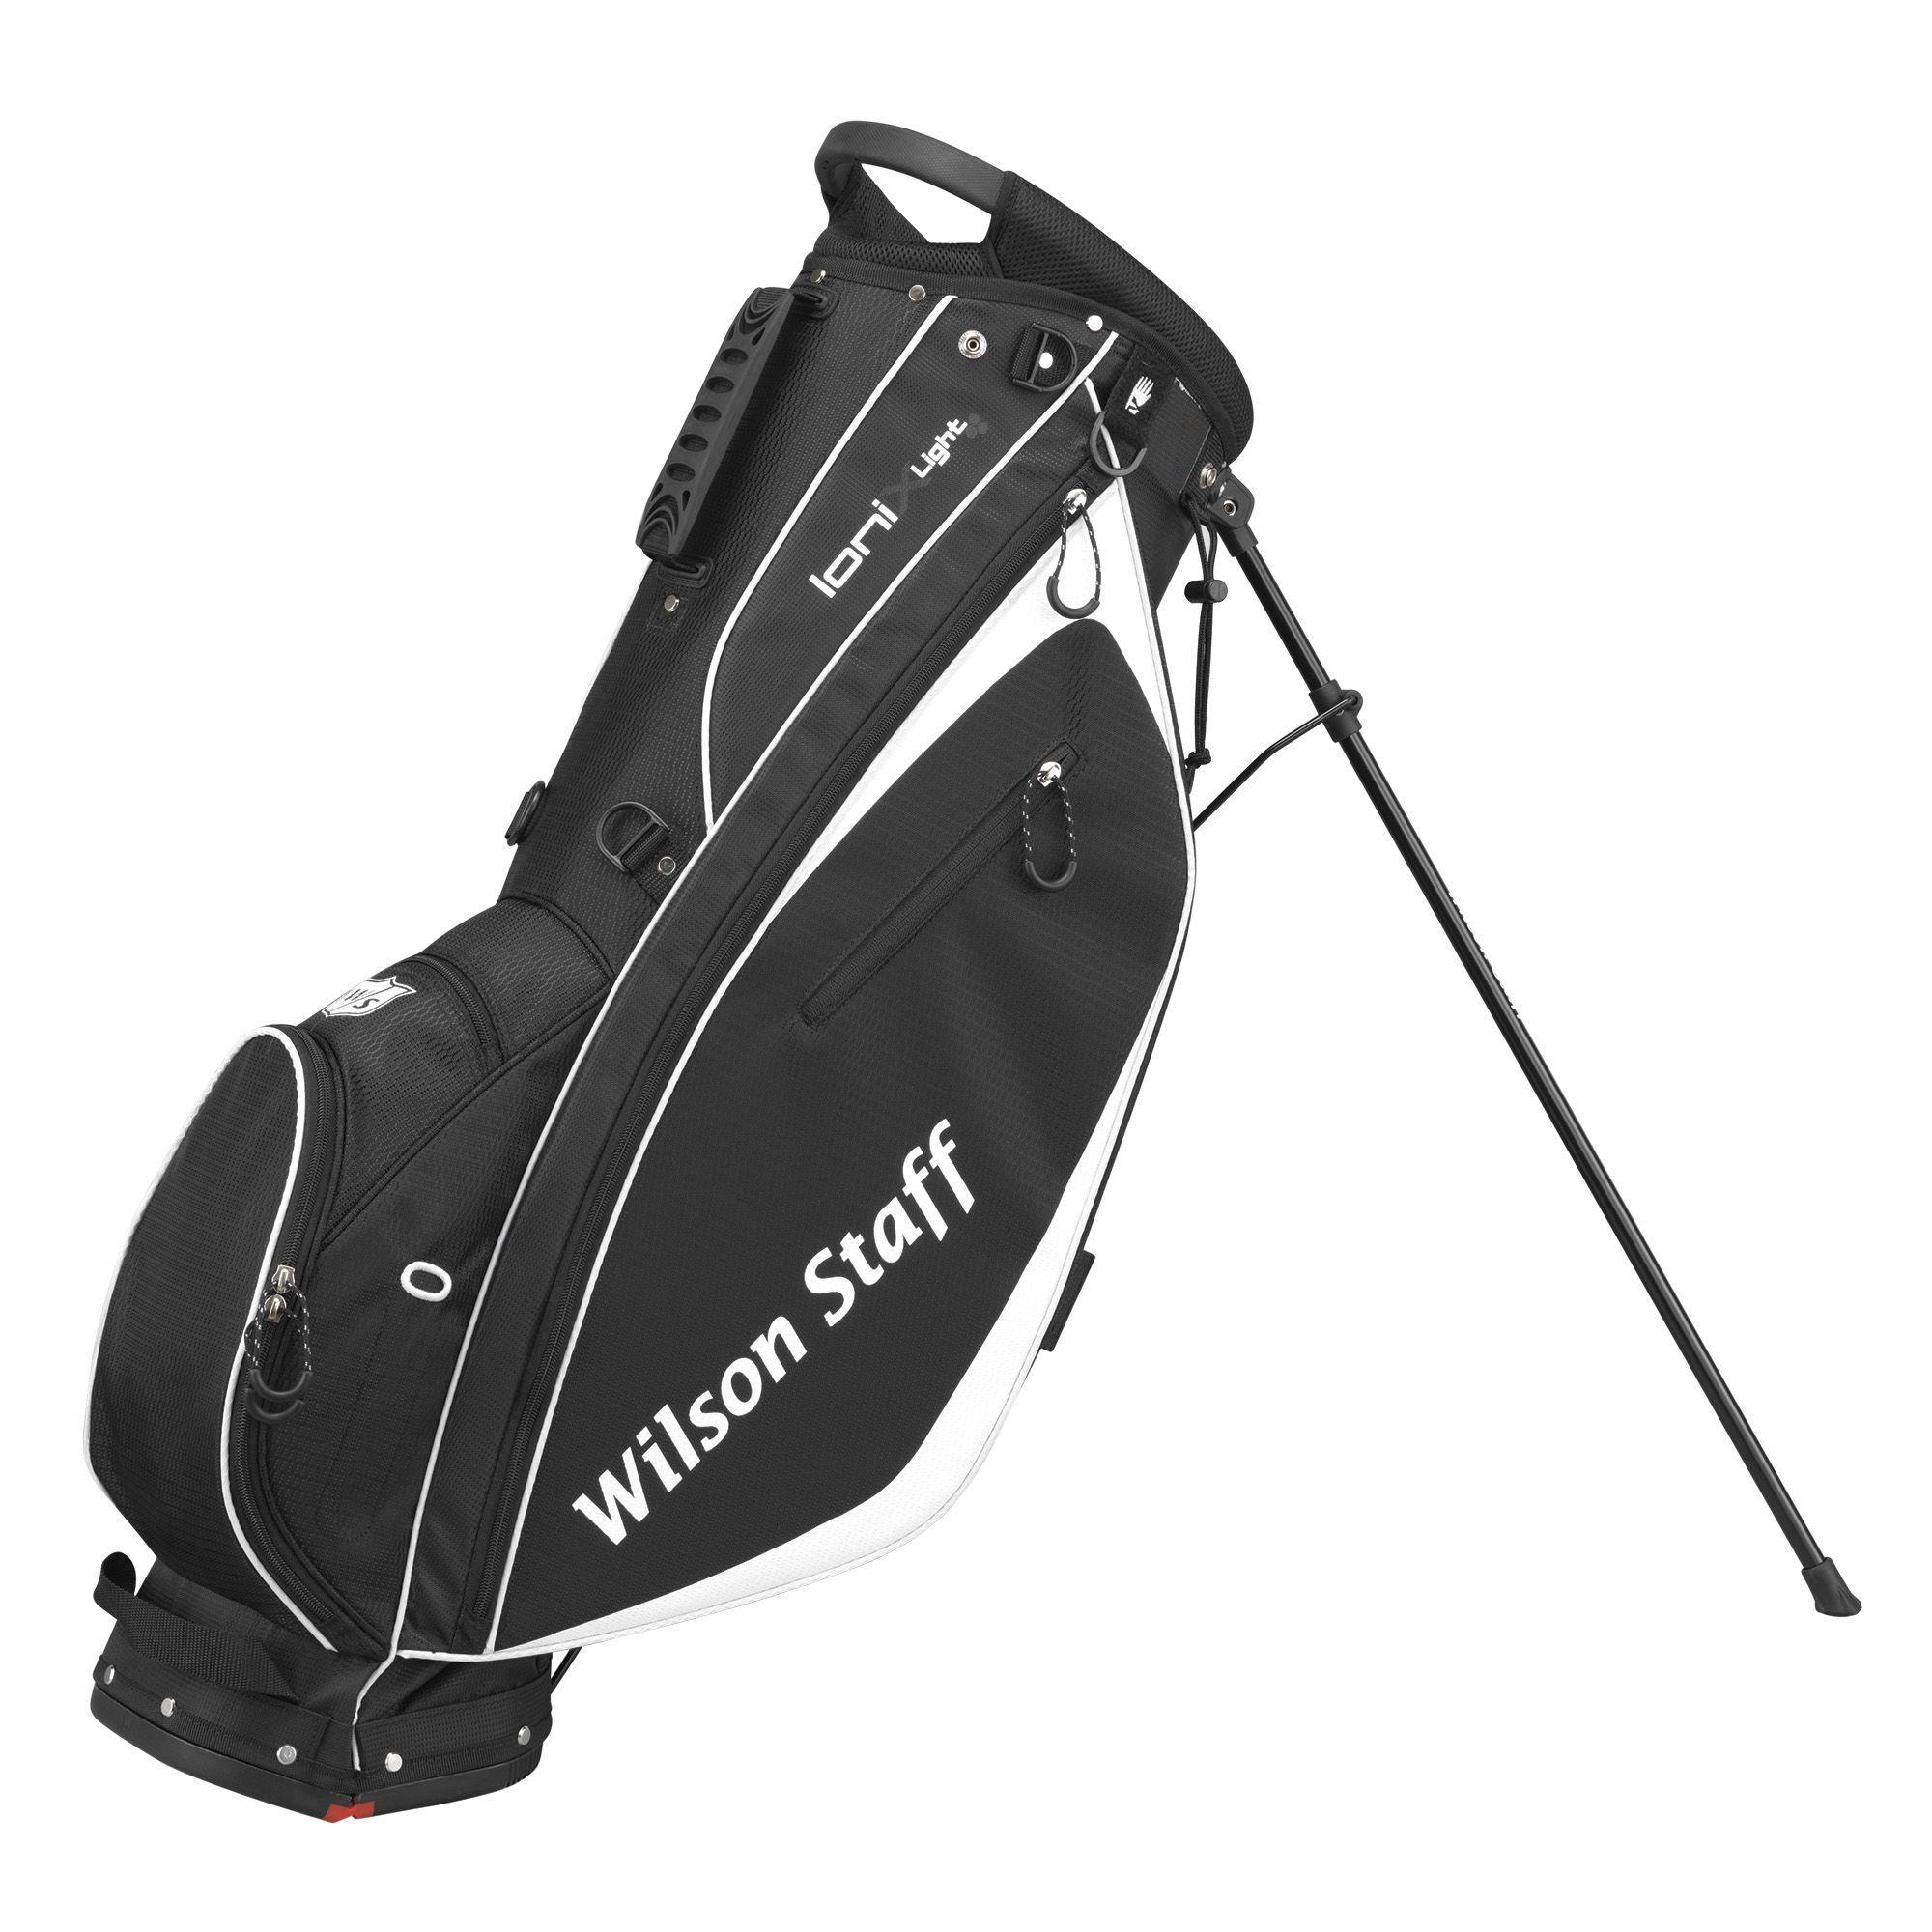 wilson staff ionix light golf carry bag. Black Bedroom Furniture Sets. Home Design Ideas